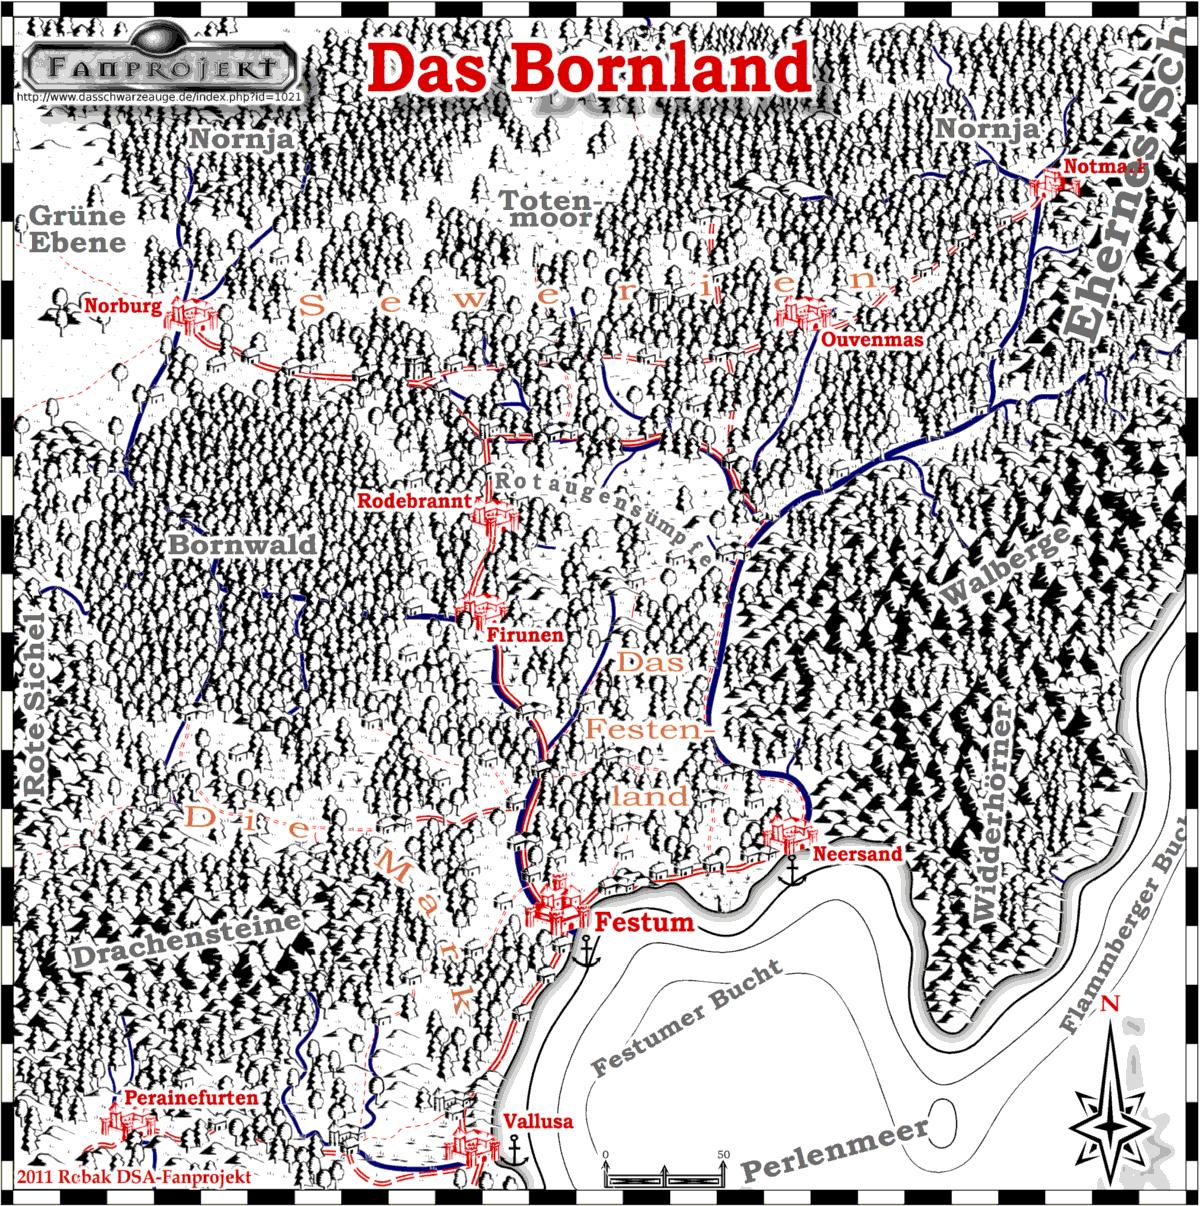 Dsa Karte Bornland.Bornland By Robak238 On Deviantart Karten Karten